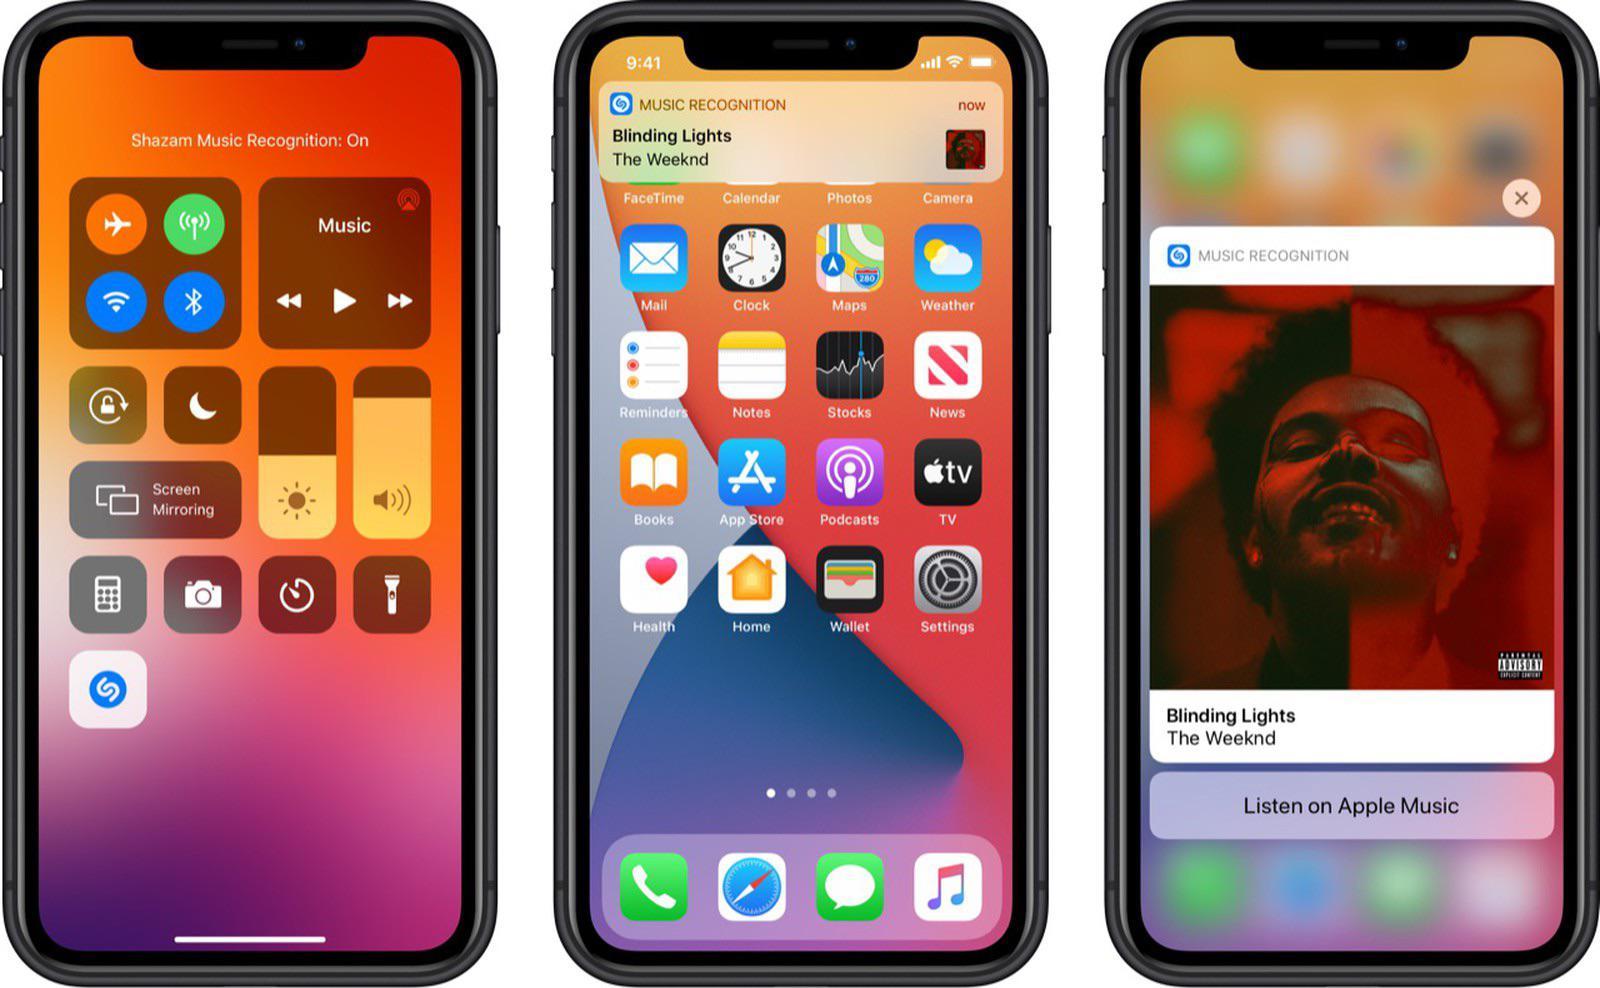 Apple tung ra iOS 14.2 Beta với nhiều thay đổi - Ảnh 1.